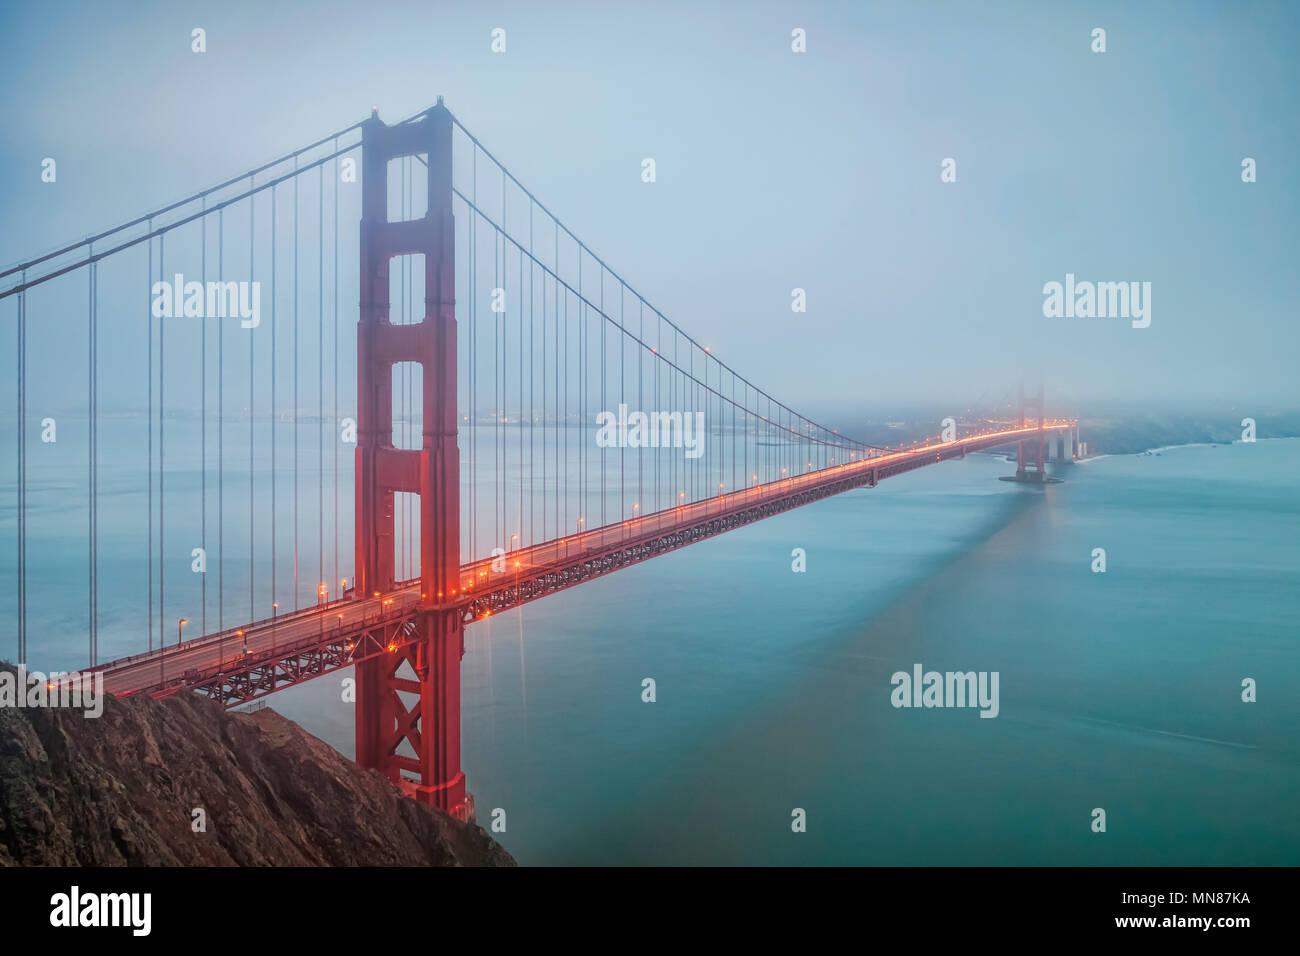 A foggy morning at Golden Gate Bridge, San Francisco, USA. - Stock Image